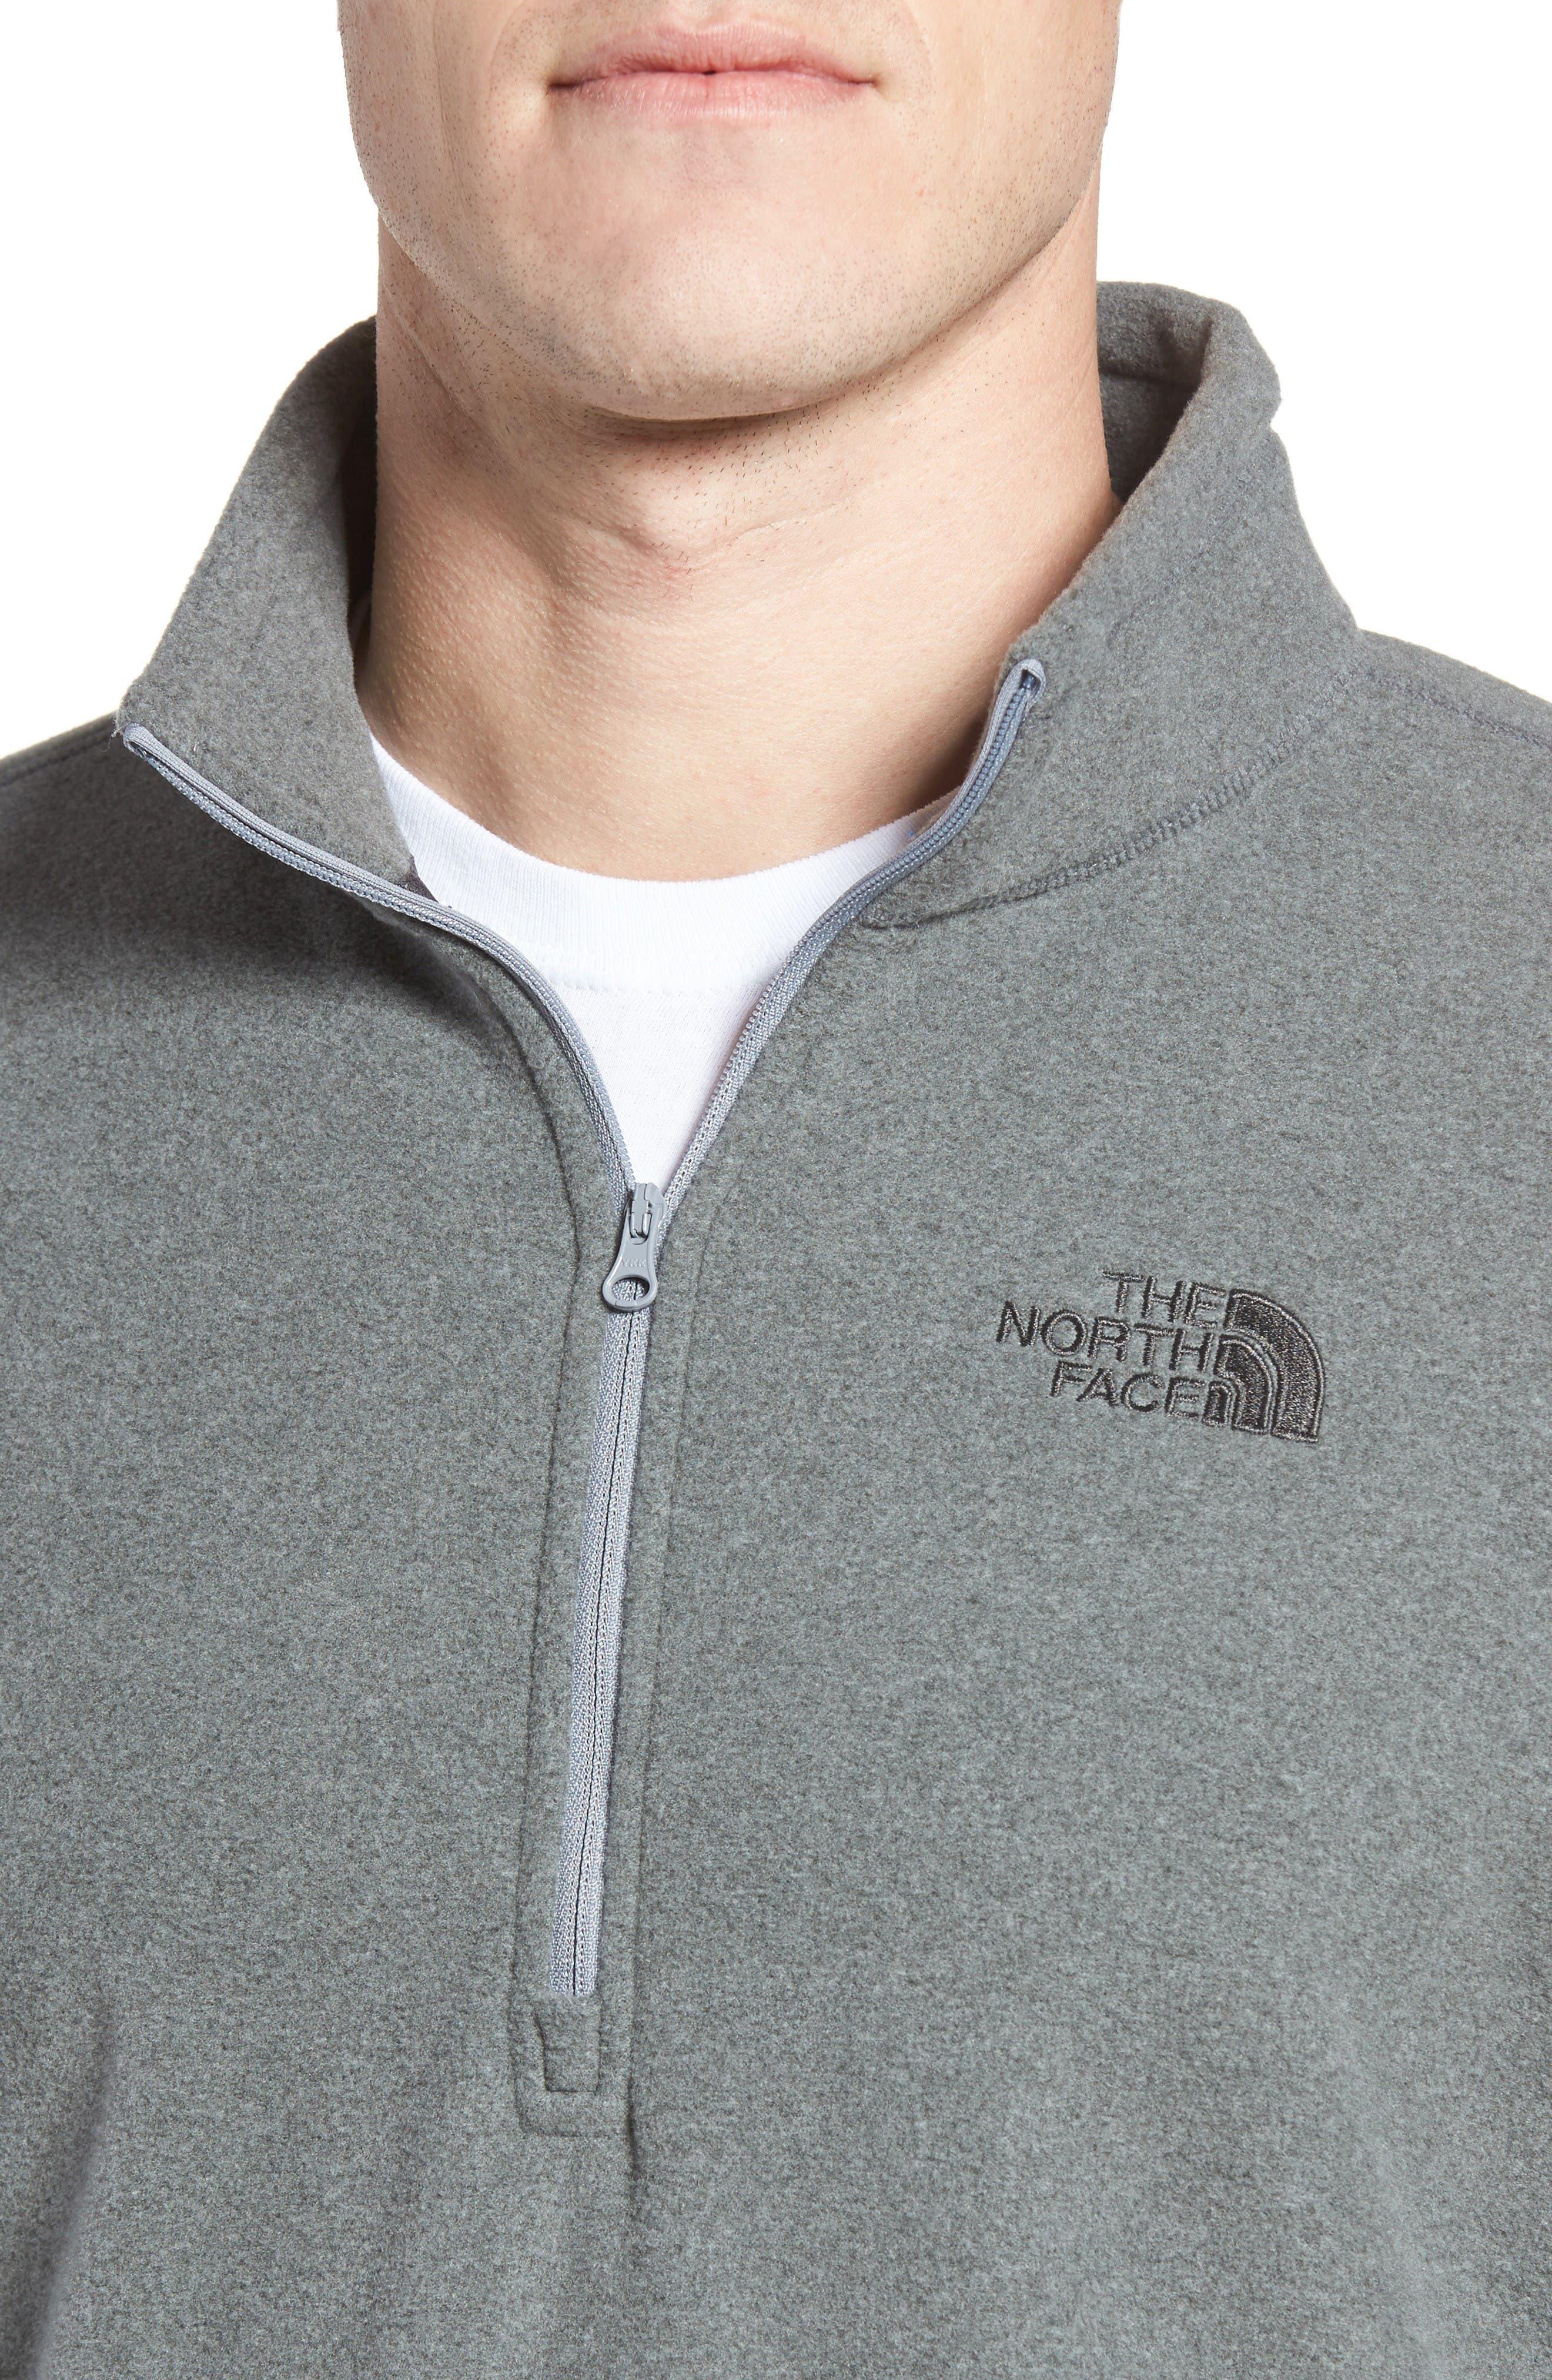 'TKA 100 Glacier' Quarter Zip Fleece Pullover,                             Alternate thumbnail 4, color,                             Tnf Medium Grey Heather